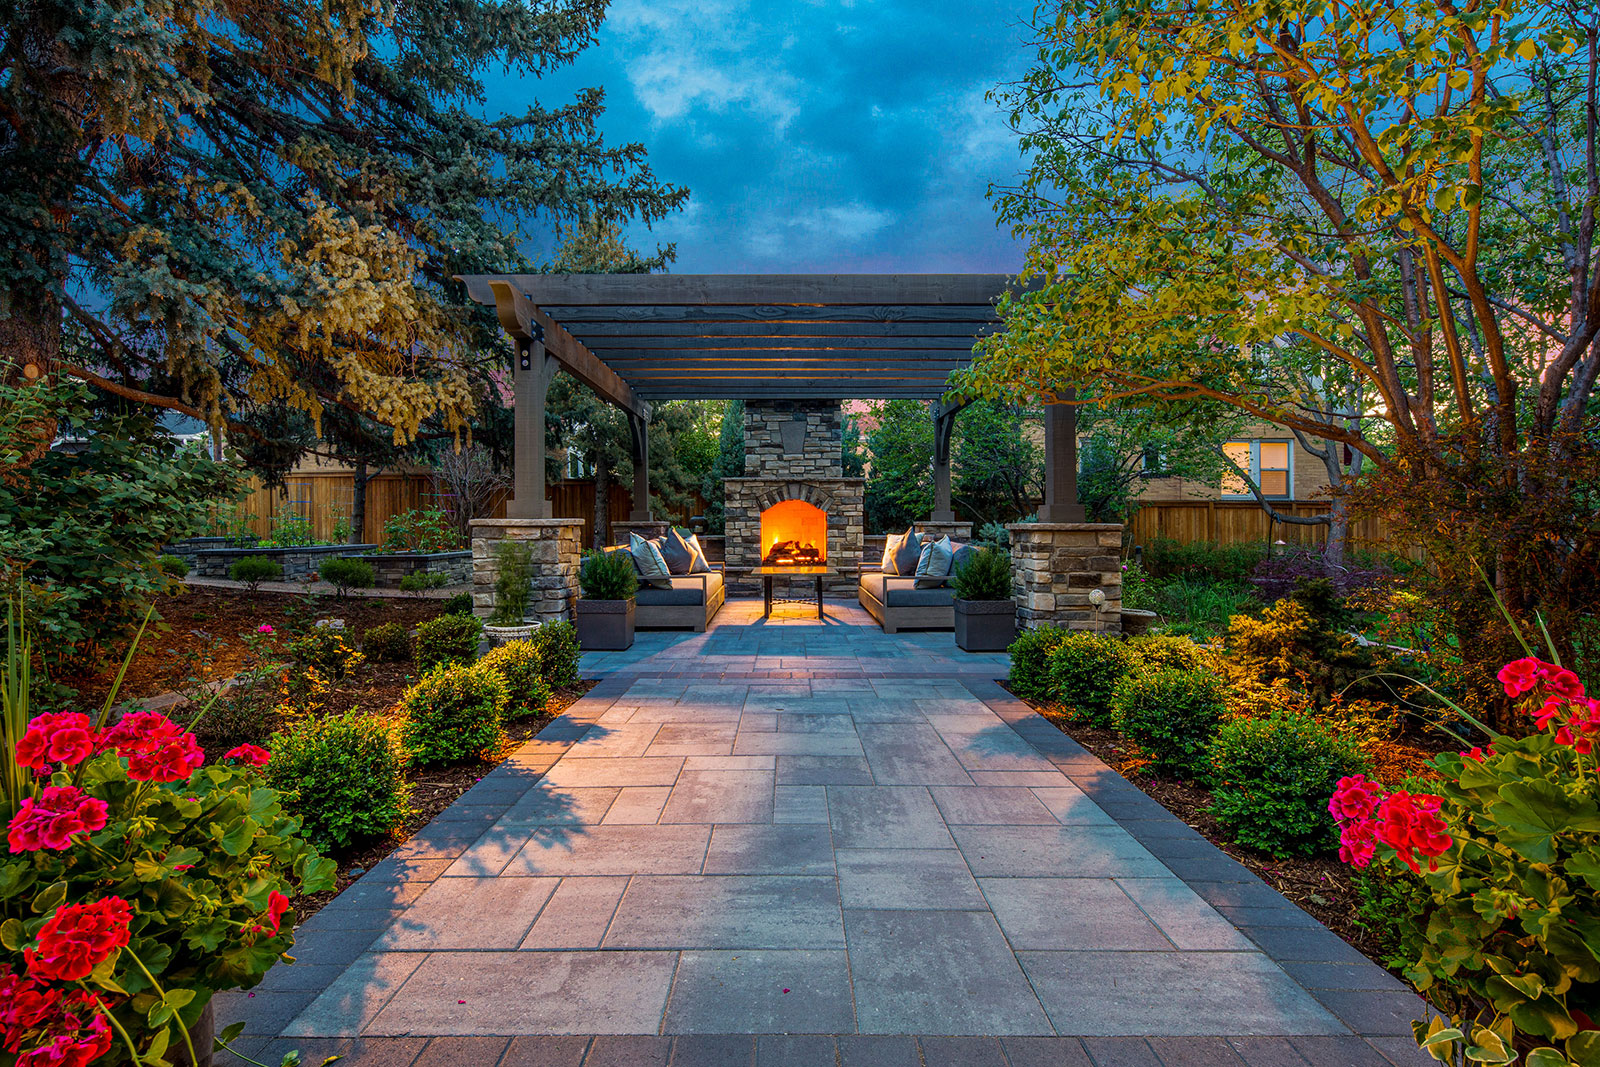 Hardscapes Portfolio - Elite Landscape & Outdoor Living ... on Elite Landscape And Outdoor Living id=58627